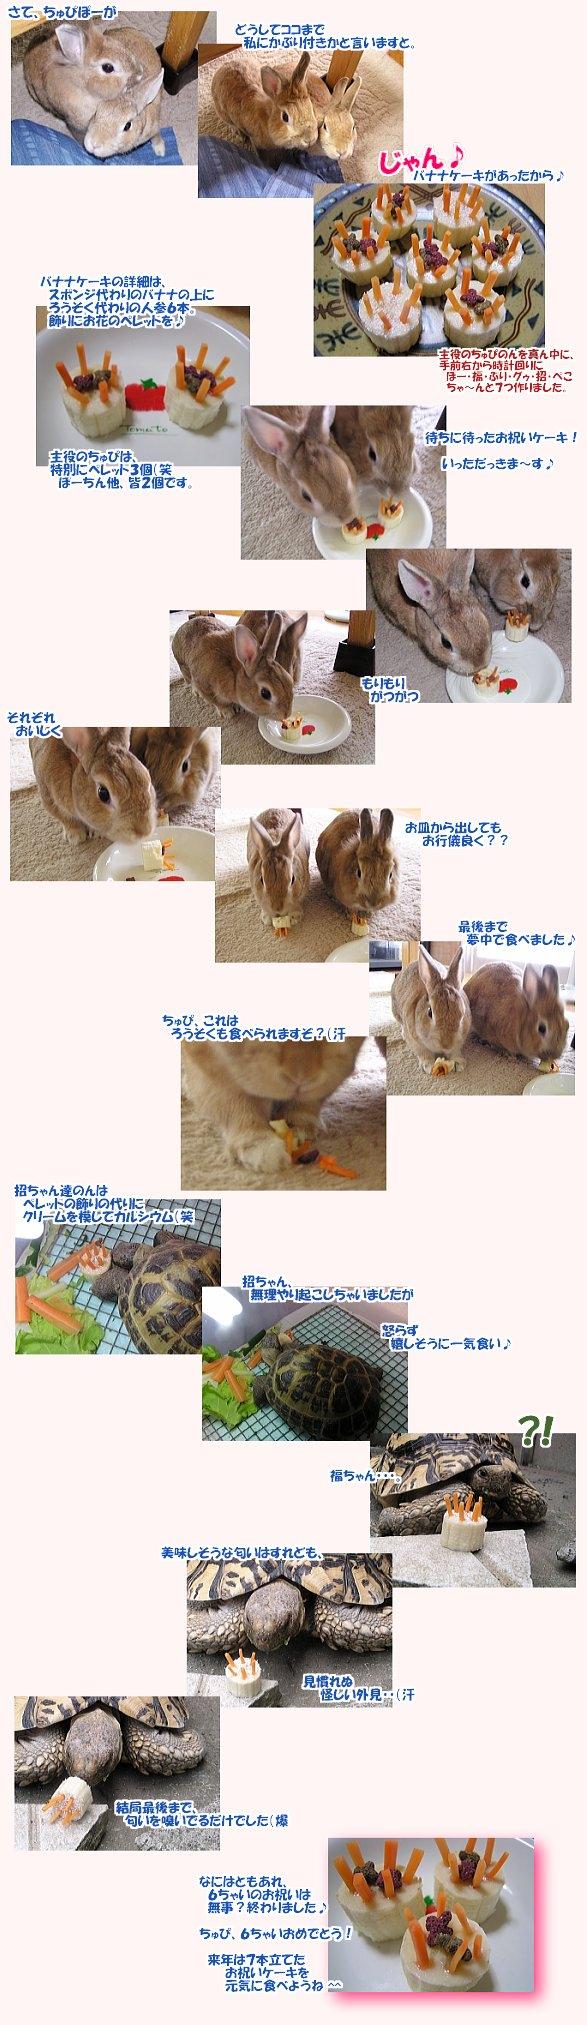 oiwaike-ki0707.jpg